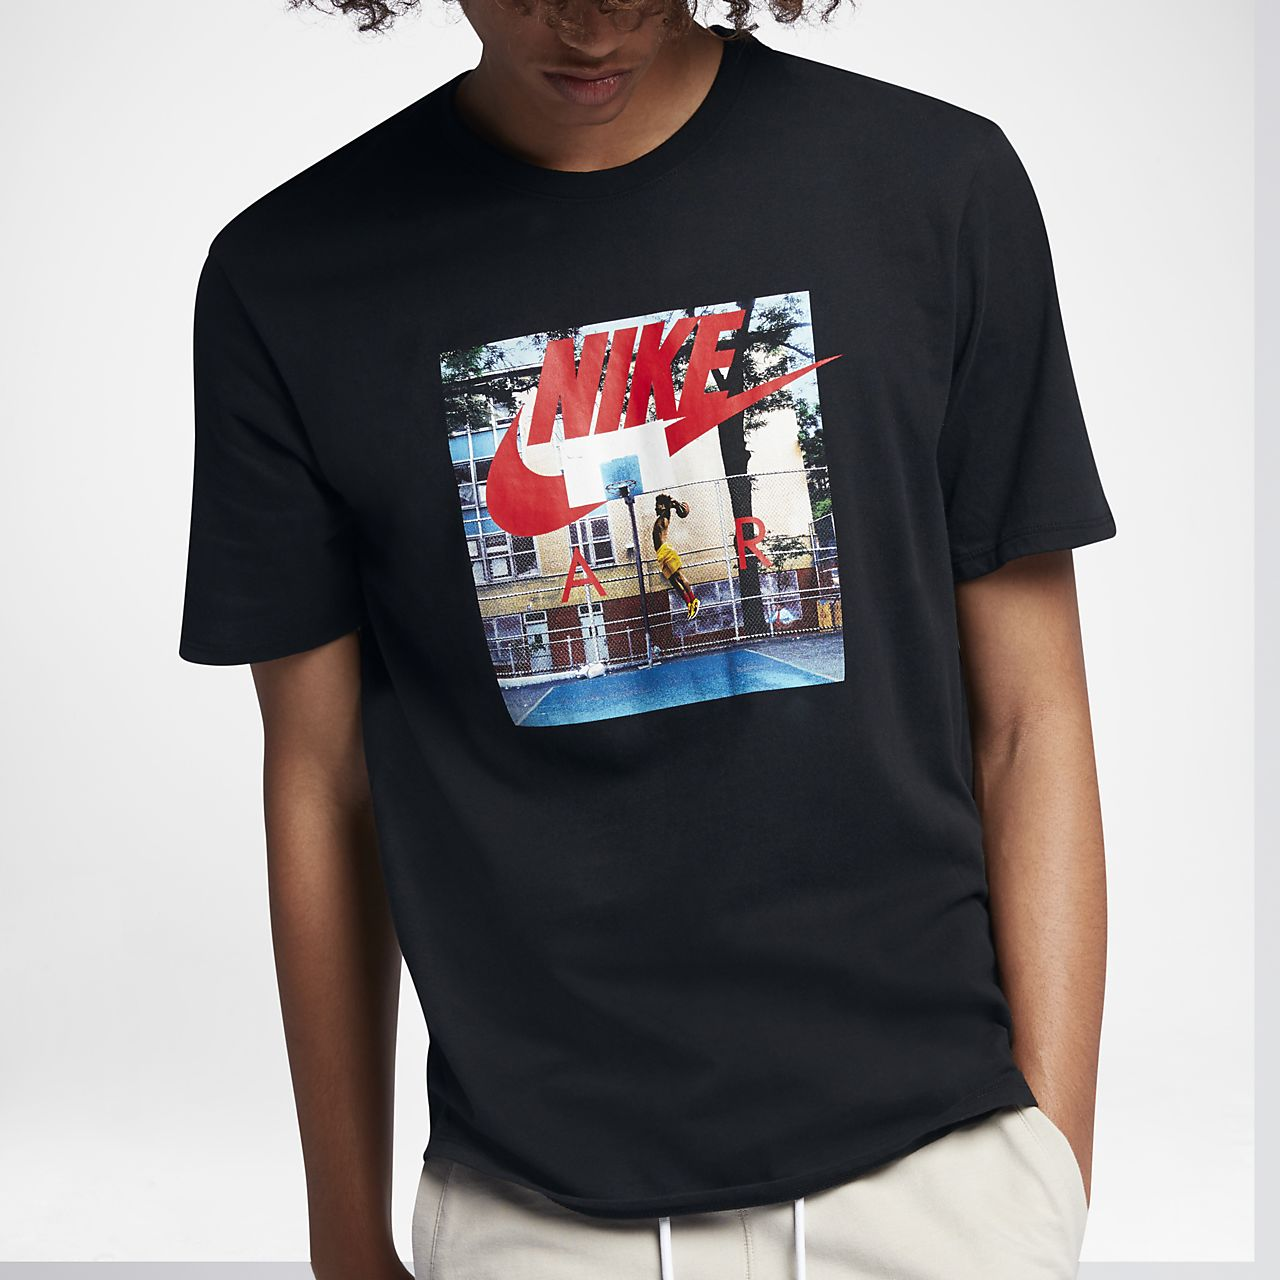 87af7887b4aba4 Nike Sportswear Air Photo Men s T-Shirt. Nike.com ID